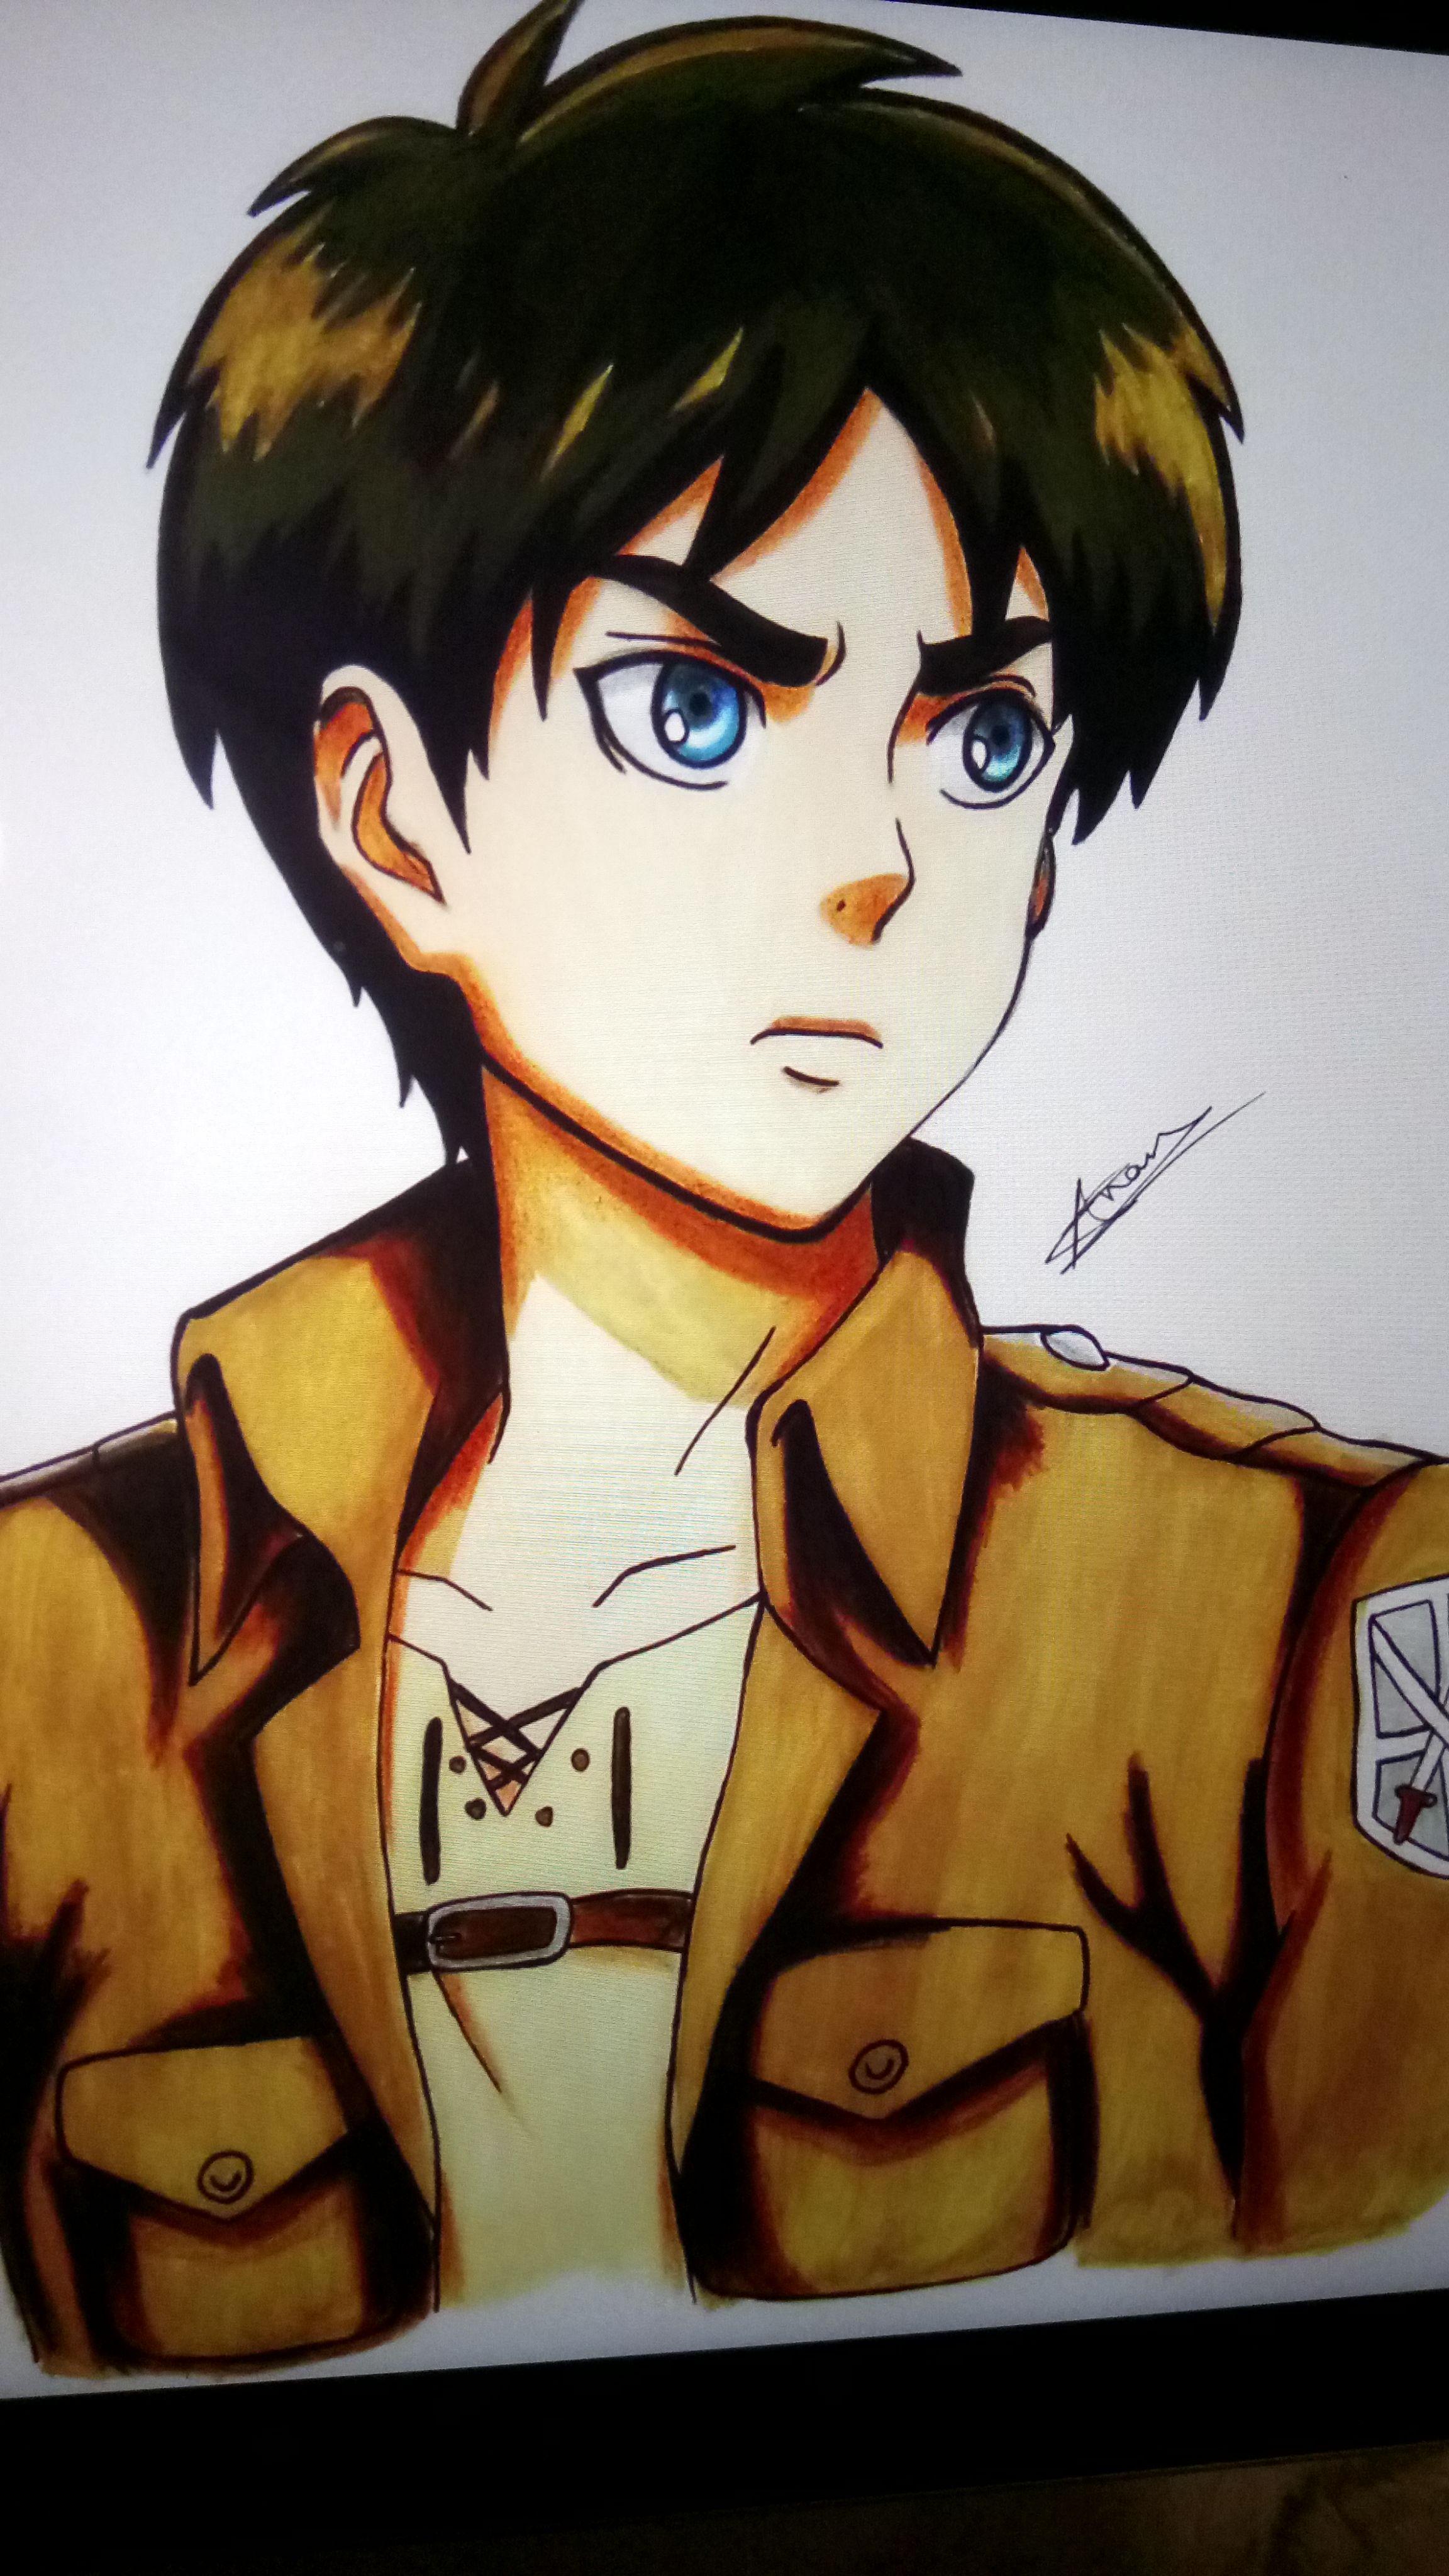 Eren Dibujo Imagenes De Anime Hd Anime De Perfil Shingeky